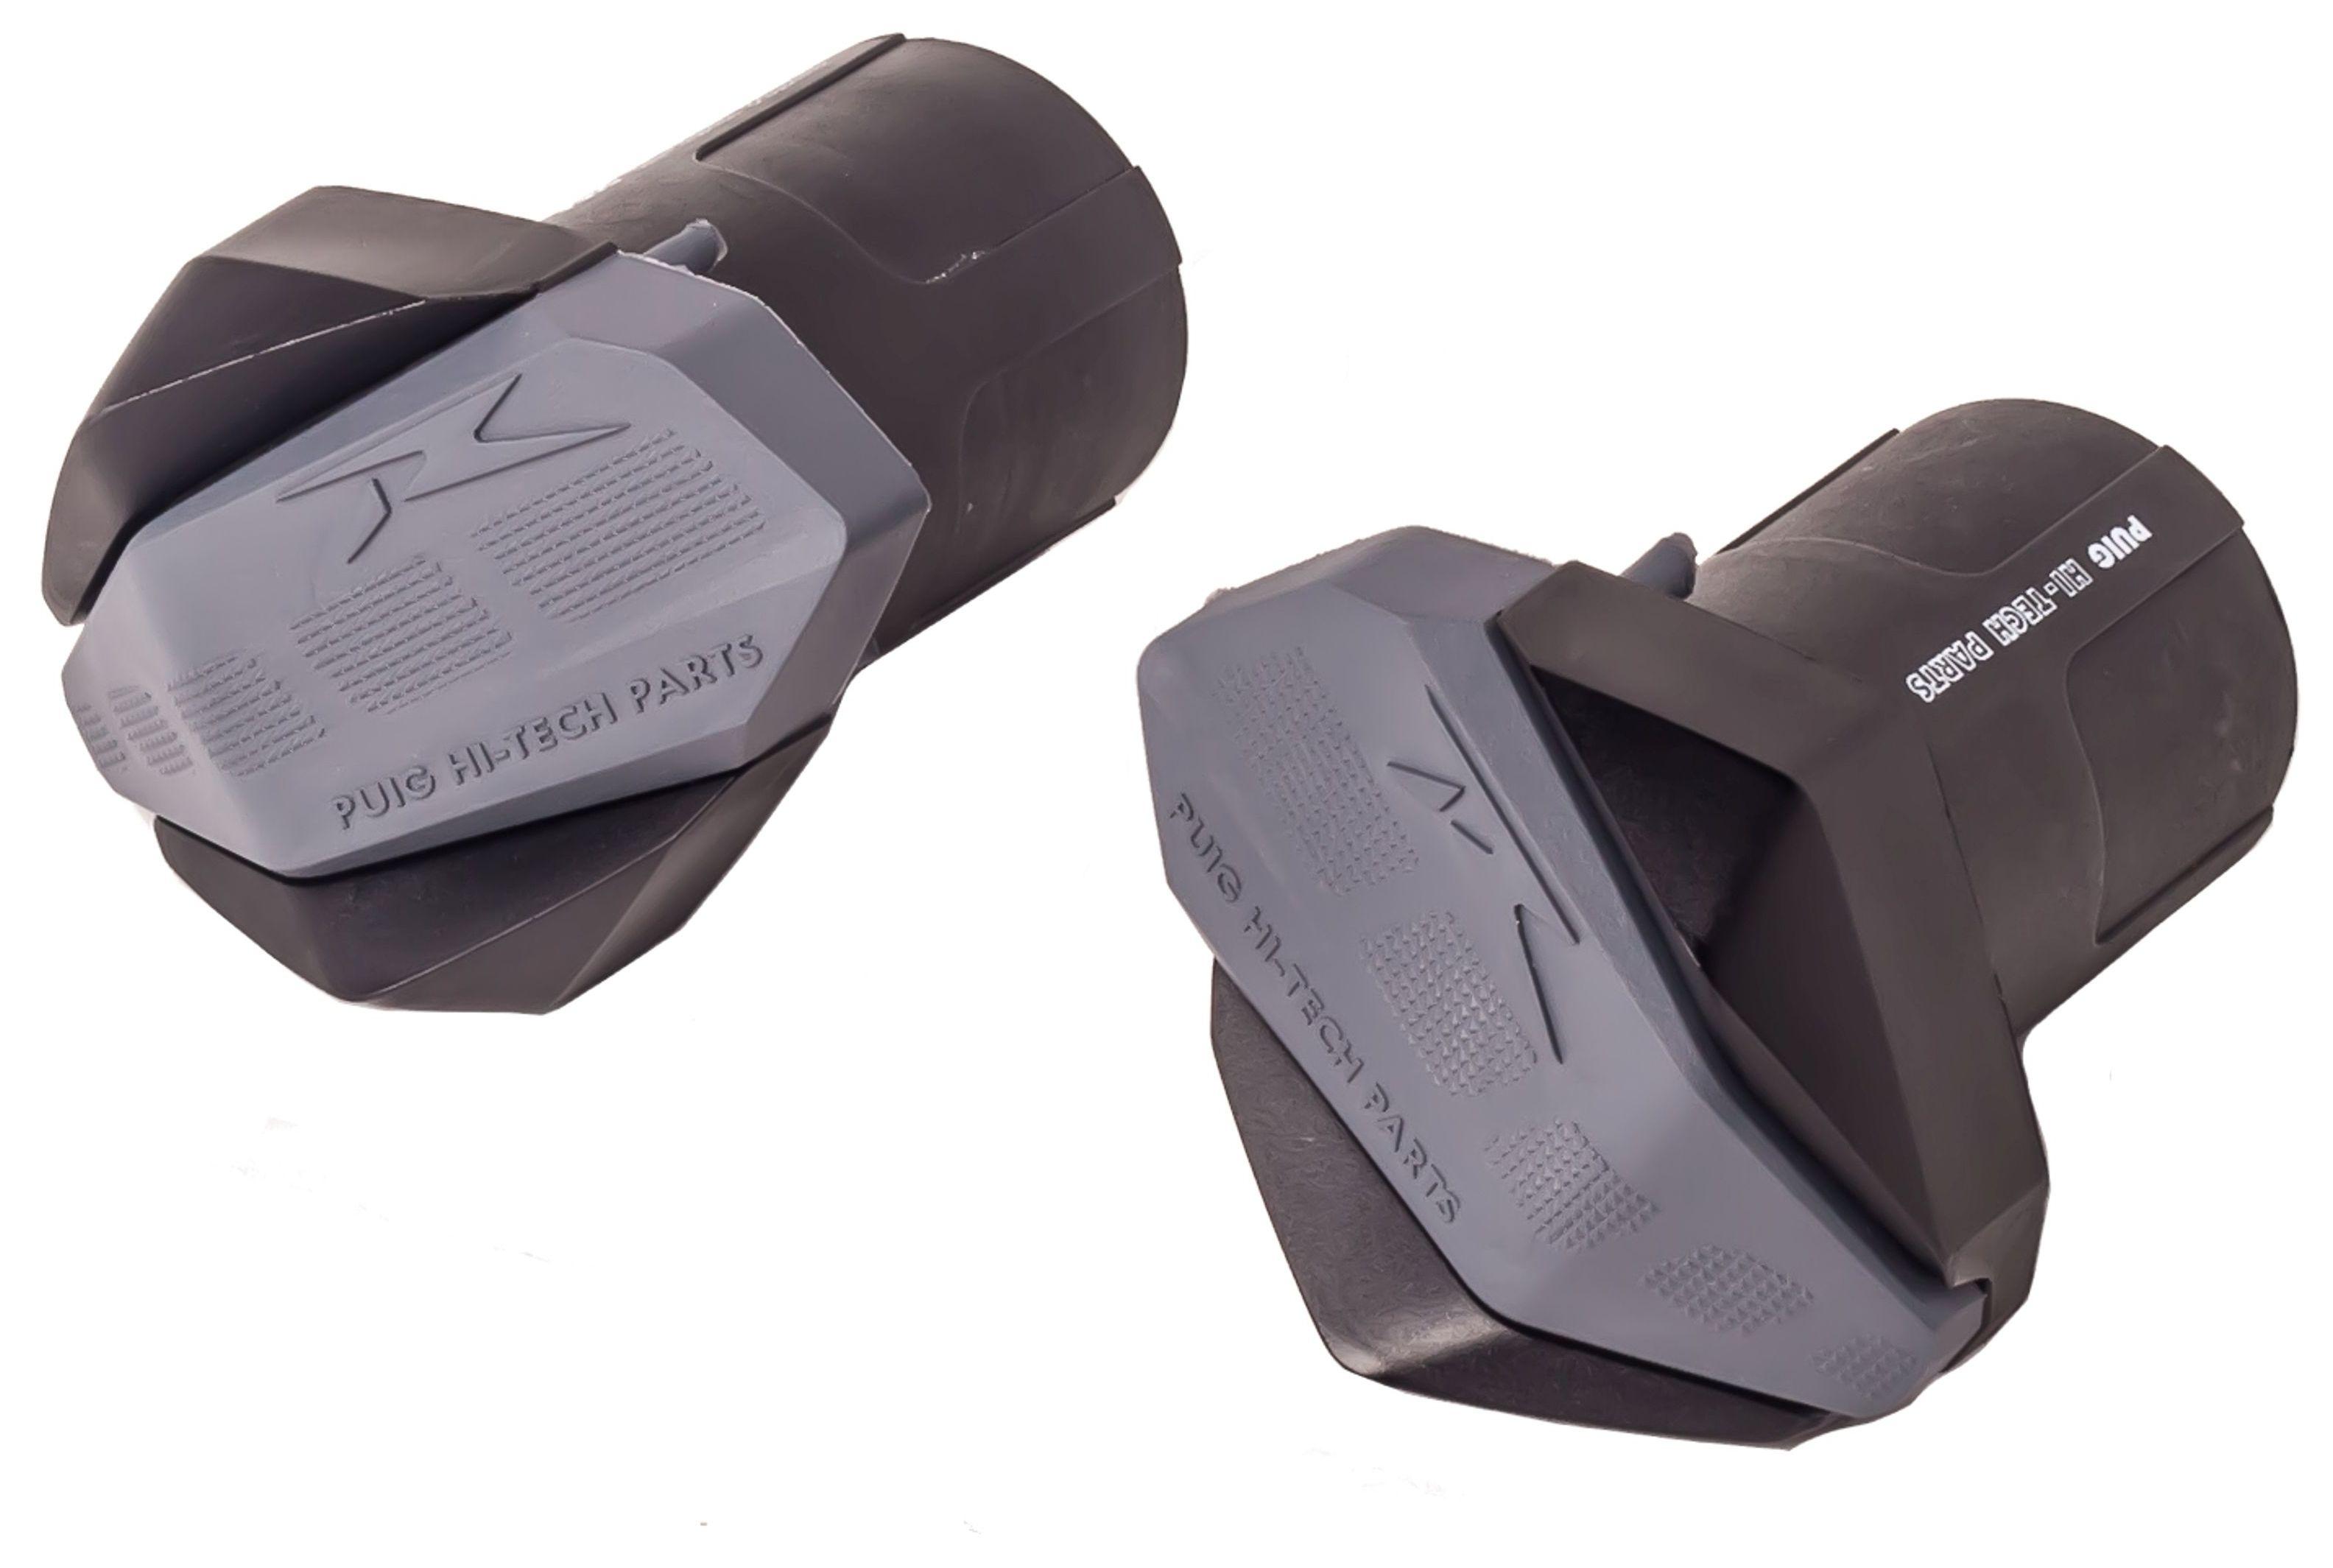 Black Motorcycle Crash Pad Frame Slider Protector For Kawasaki Versys 650 2015 2016 2017 2018